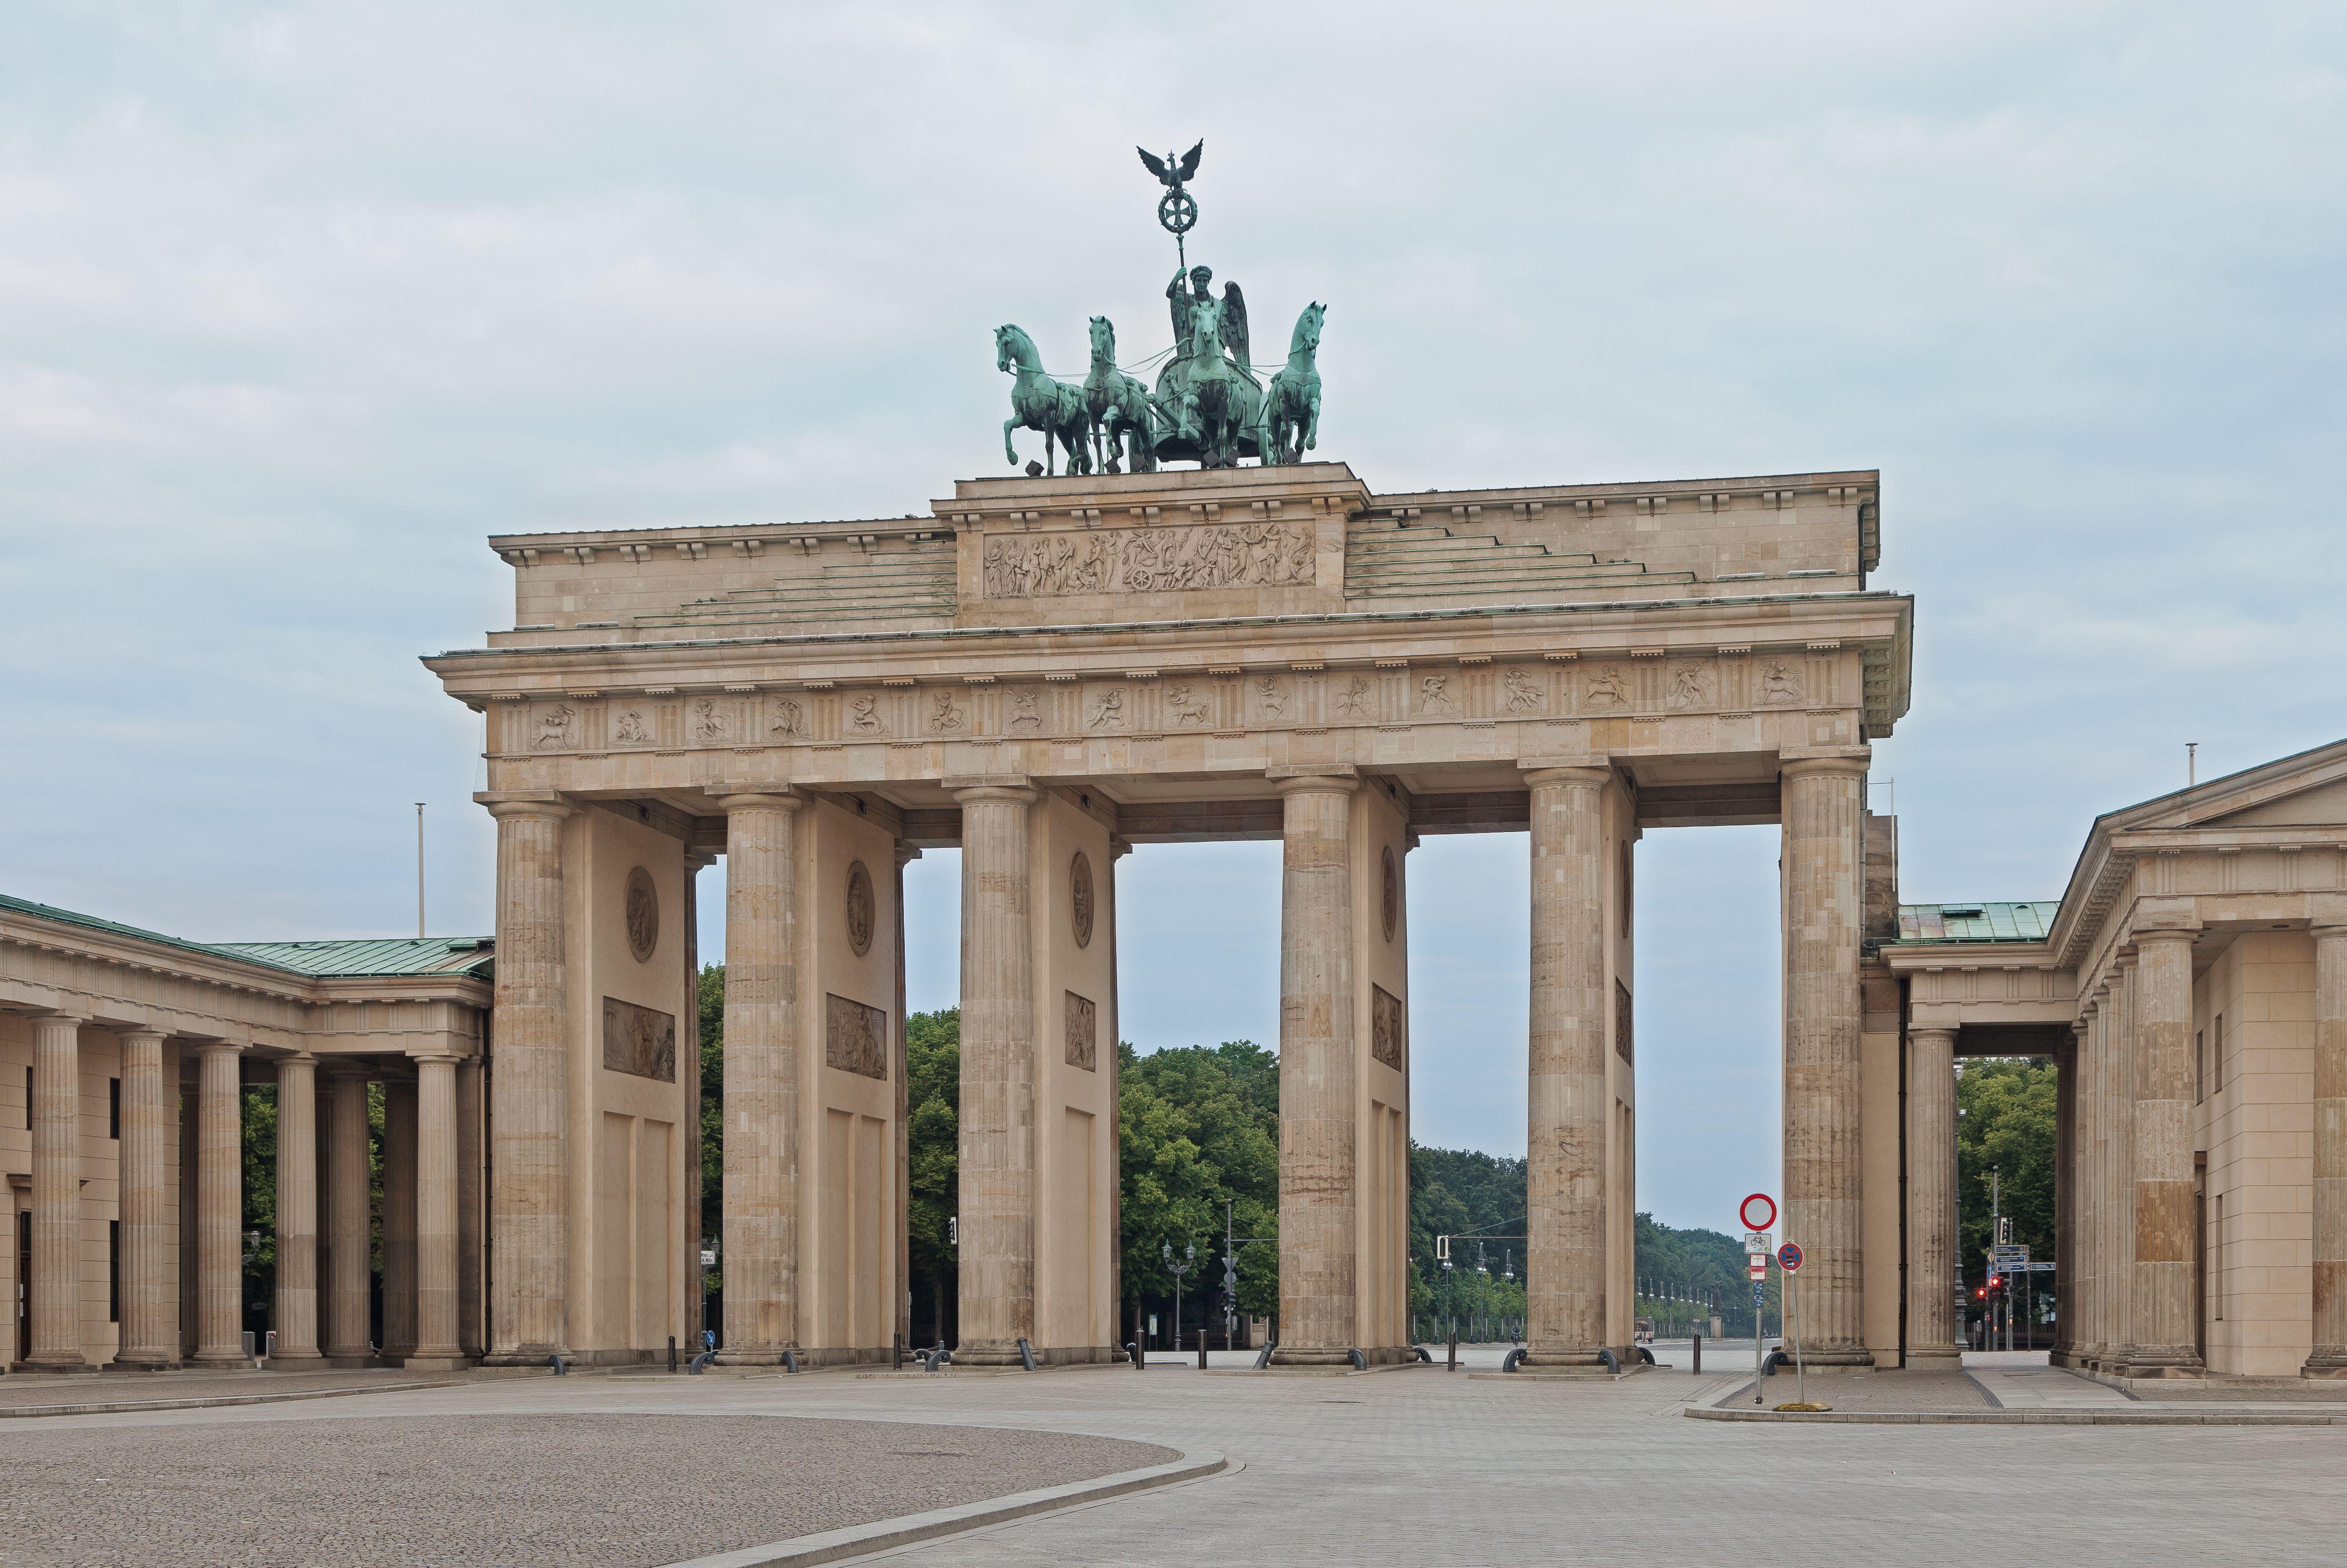 Brandenburg Gate 1788 91 Berlin Carl Gotthard Langhans Berlin Brandenburg Gate Favorite City